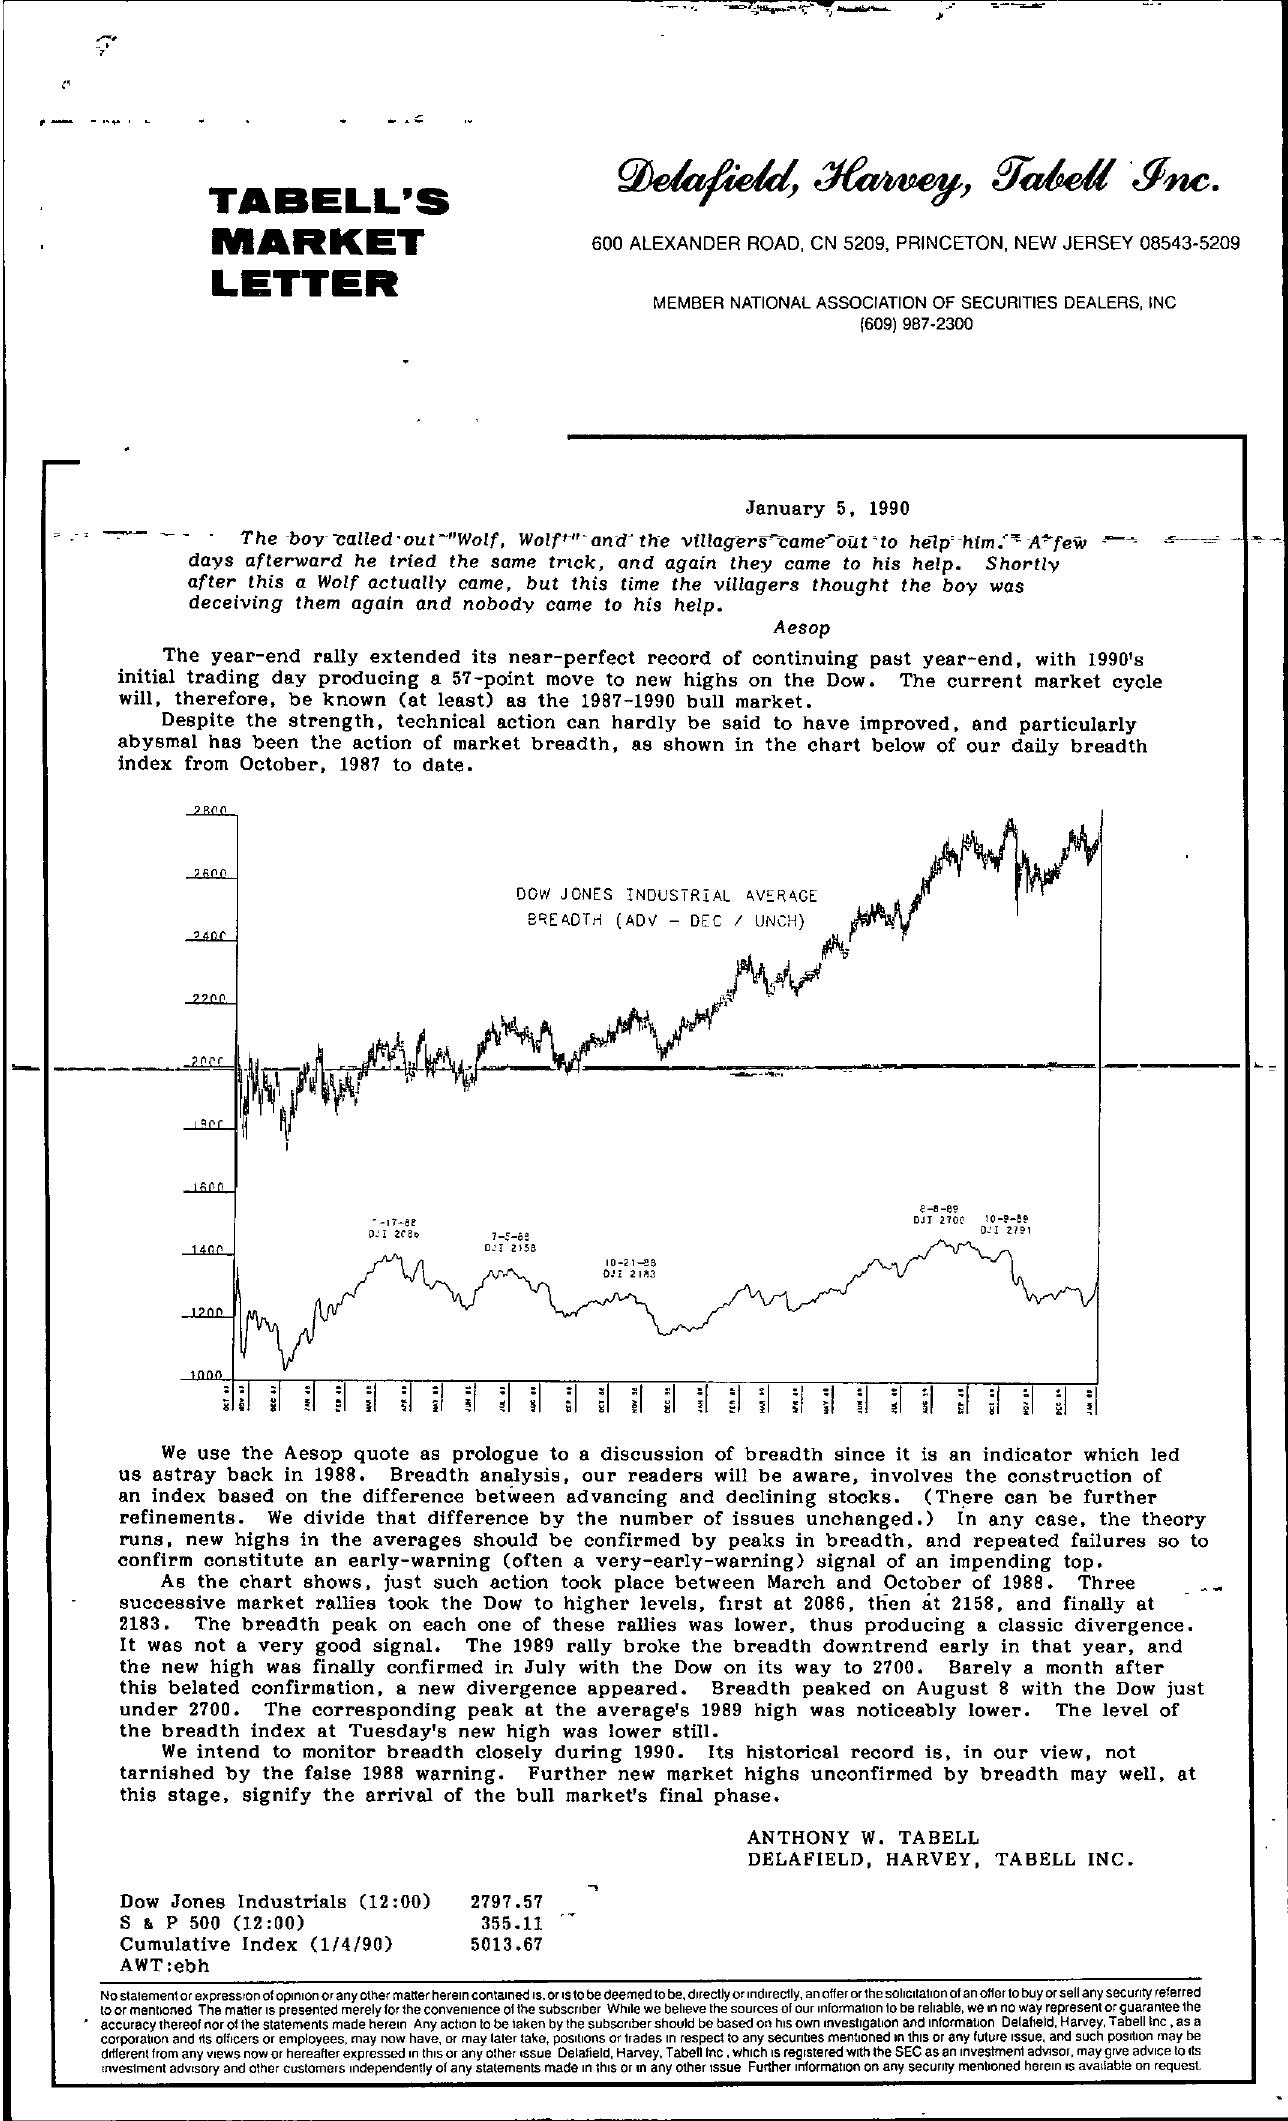 Tabell's Market Letter - January 05, 1990